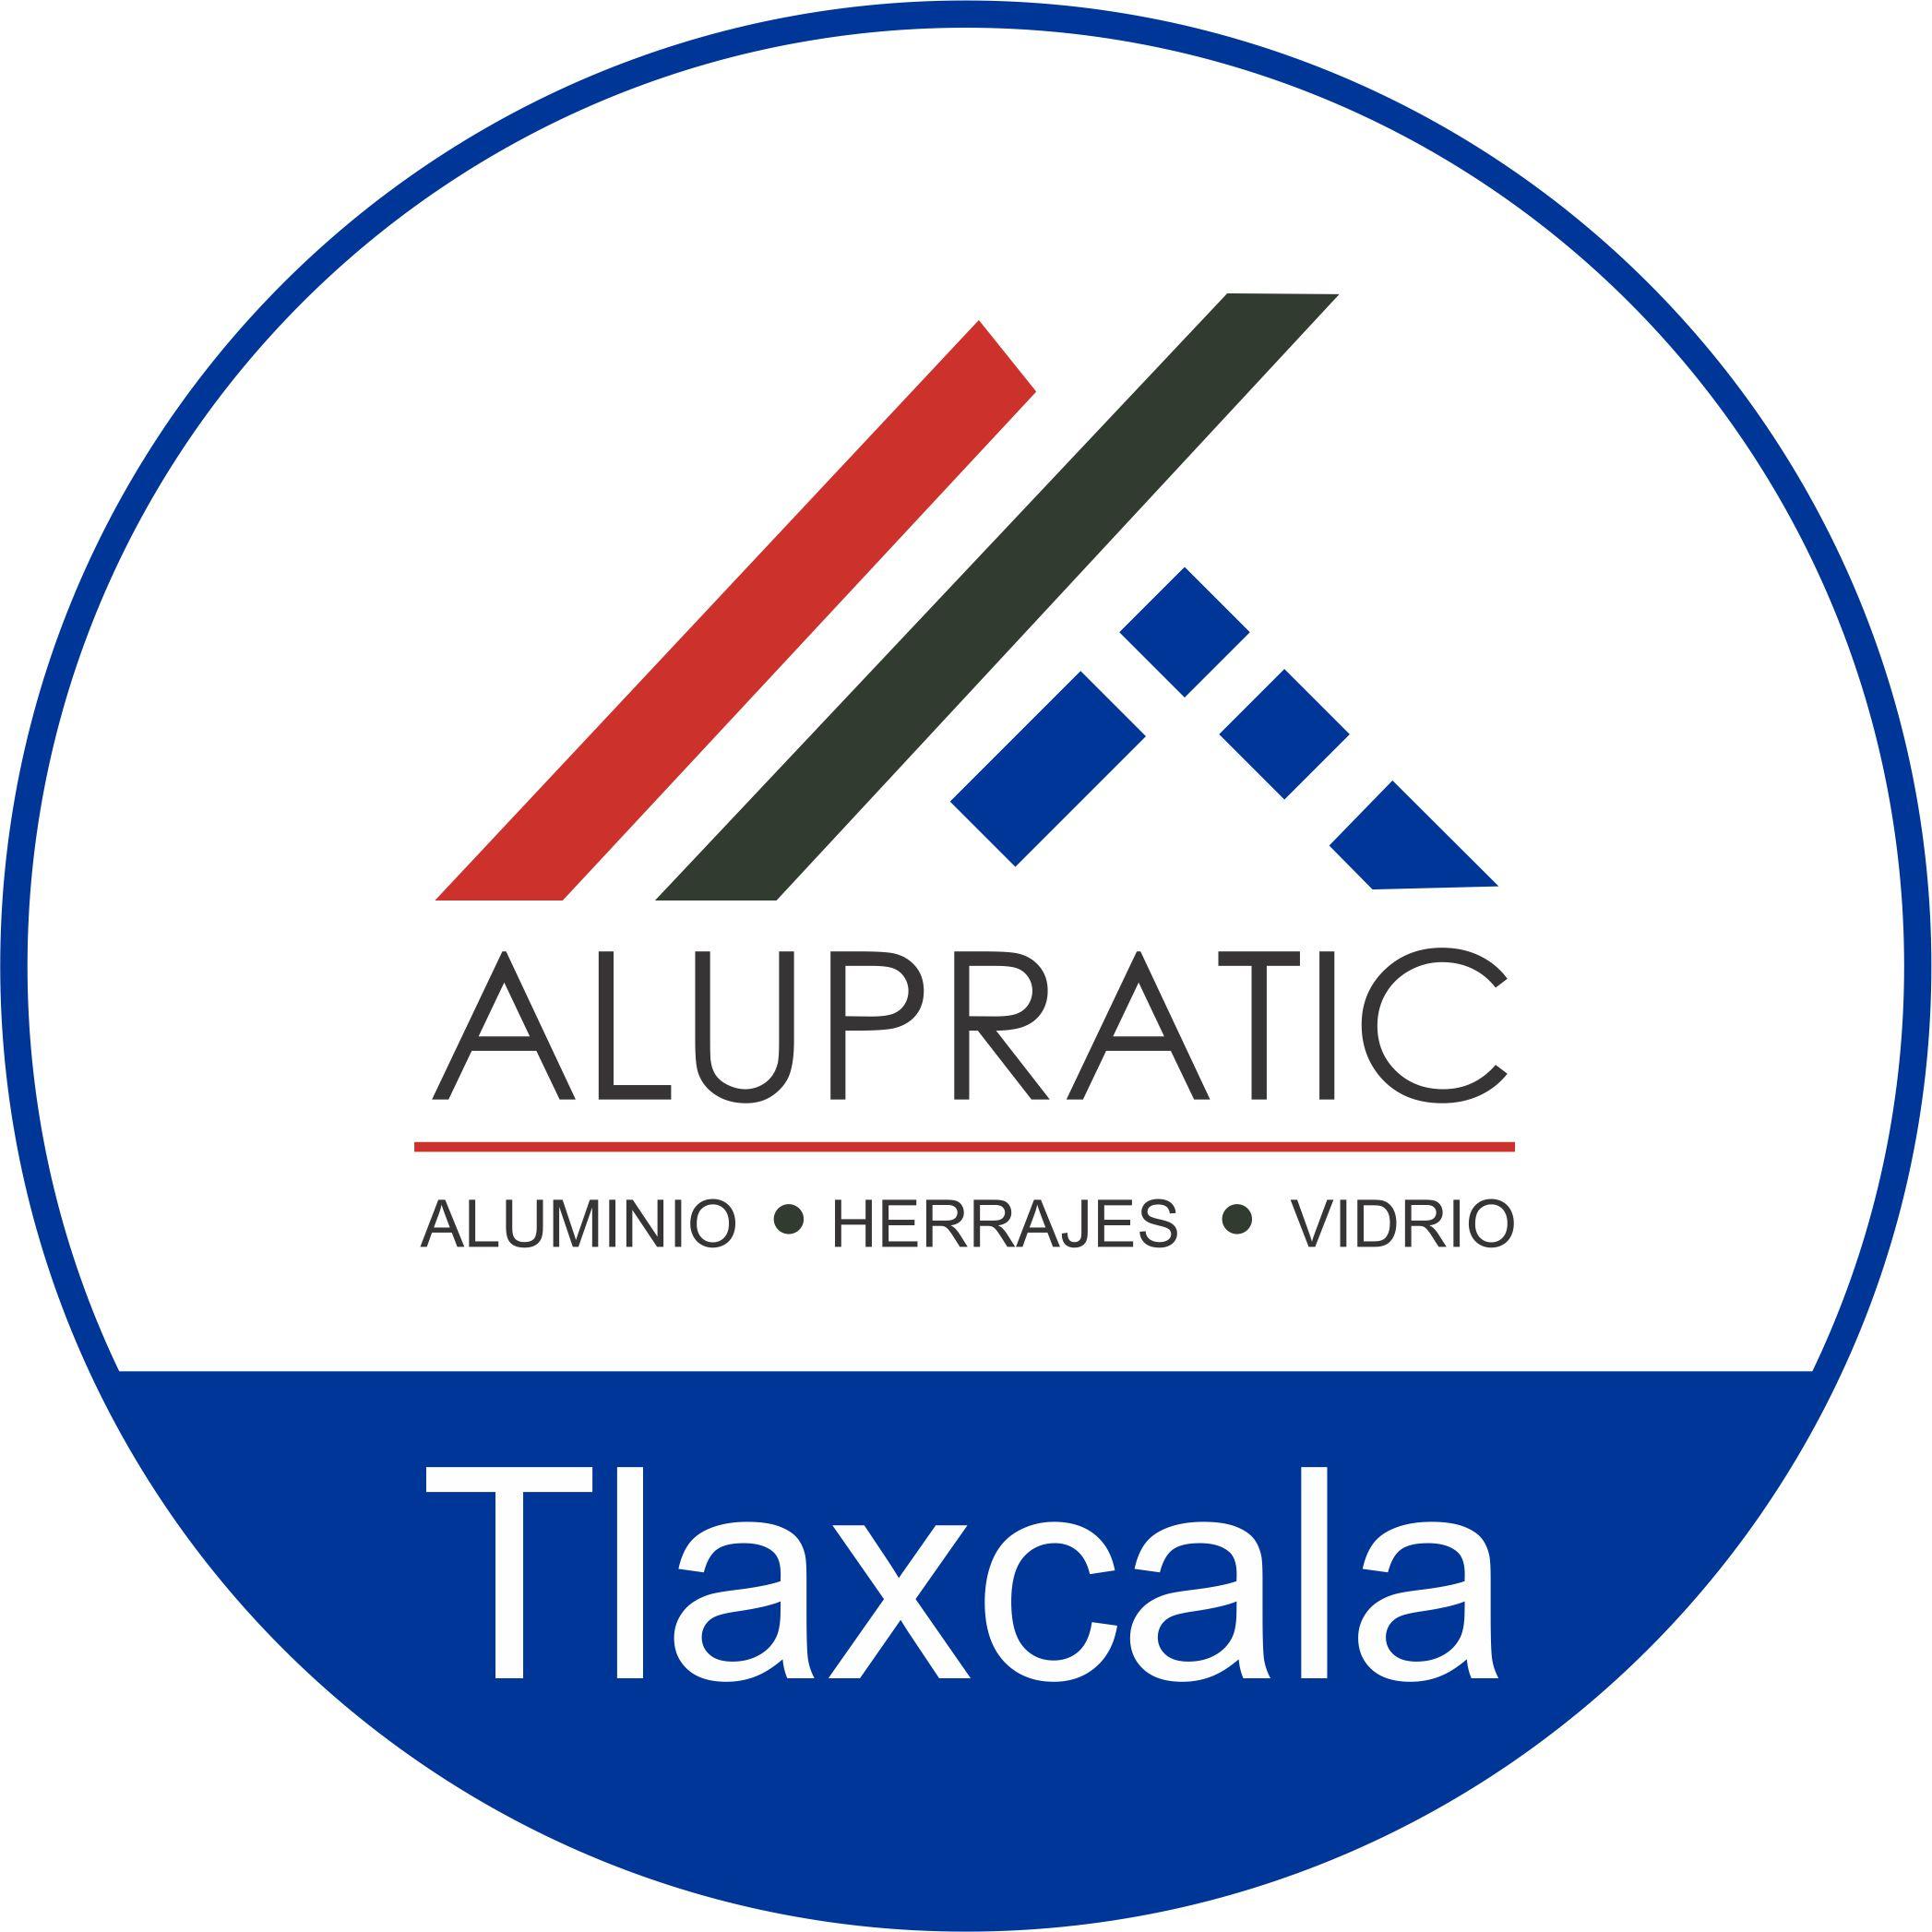 Alupratic Tlaxcala